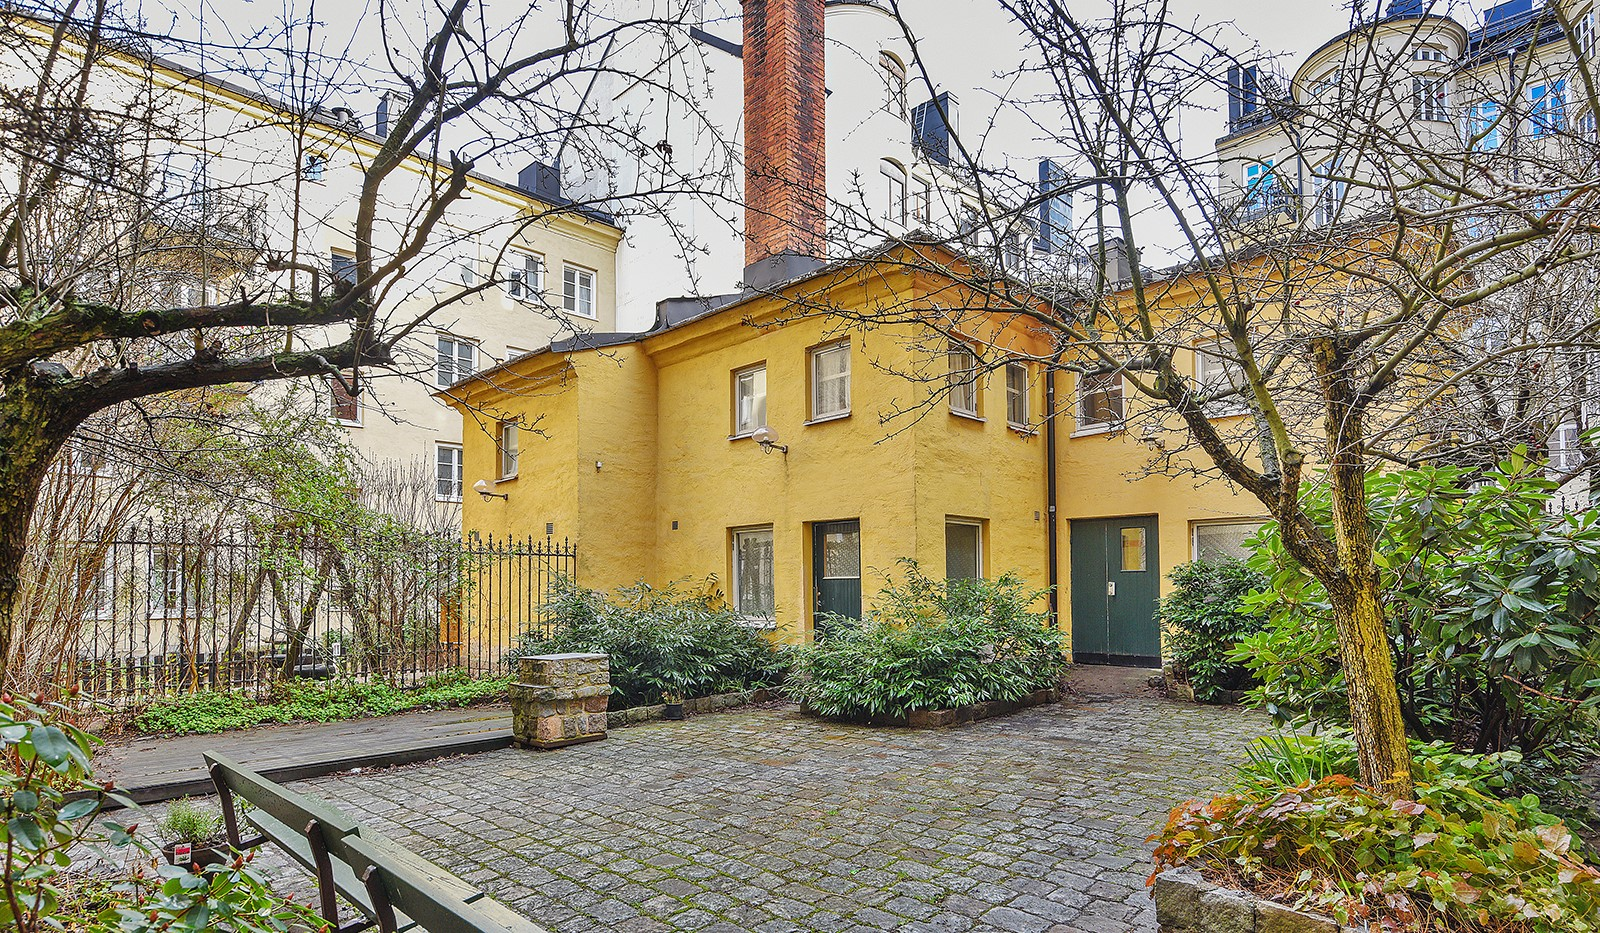 Timmermansgatan 33 - Gårdshus - bastu festlokal tvättstuga